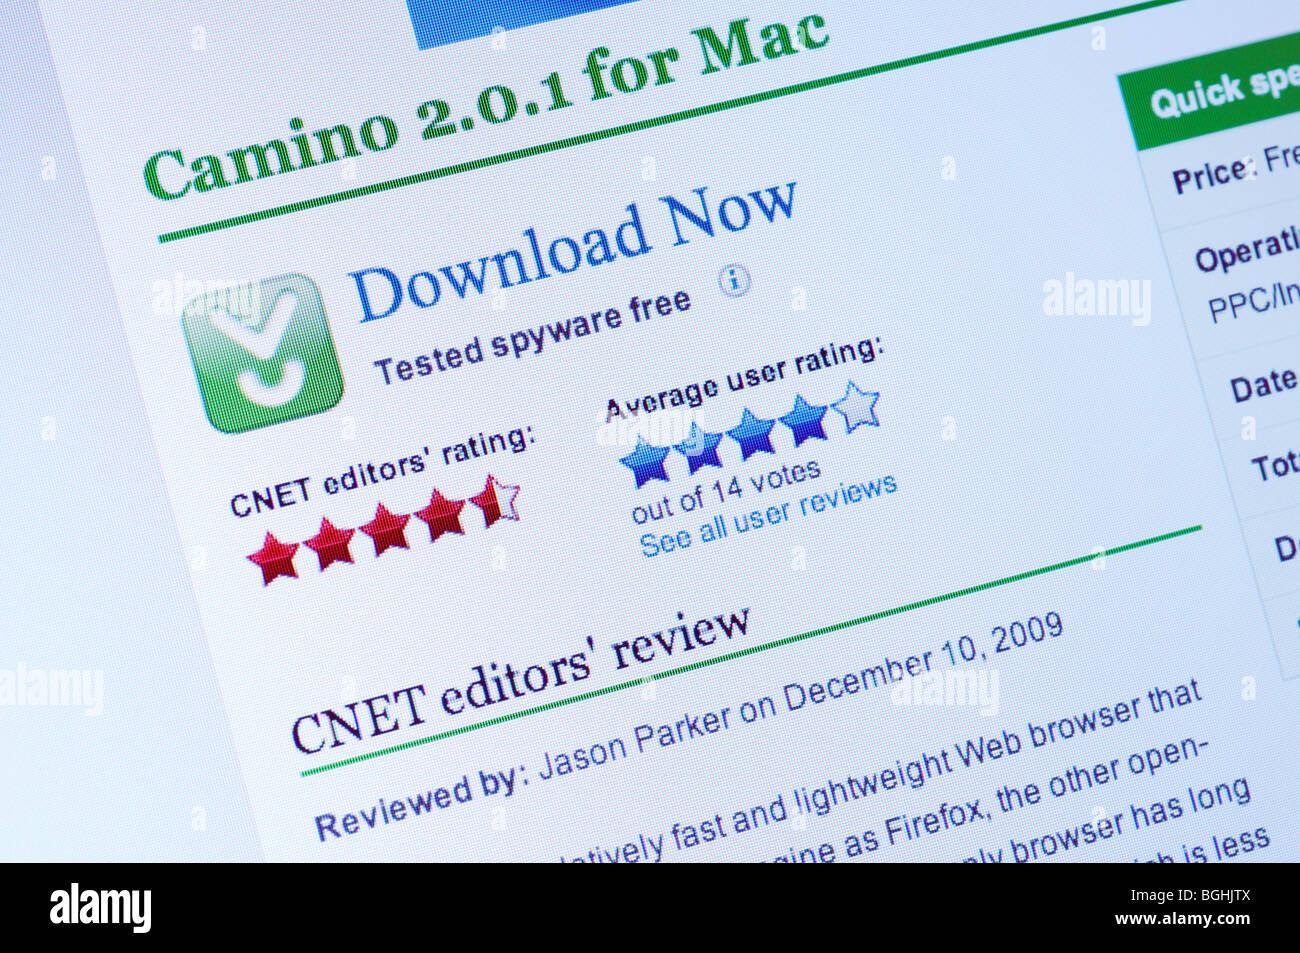 Descargar Camino website Imagen De Stock